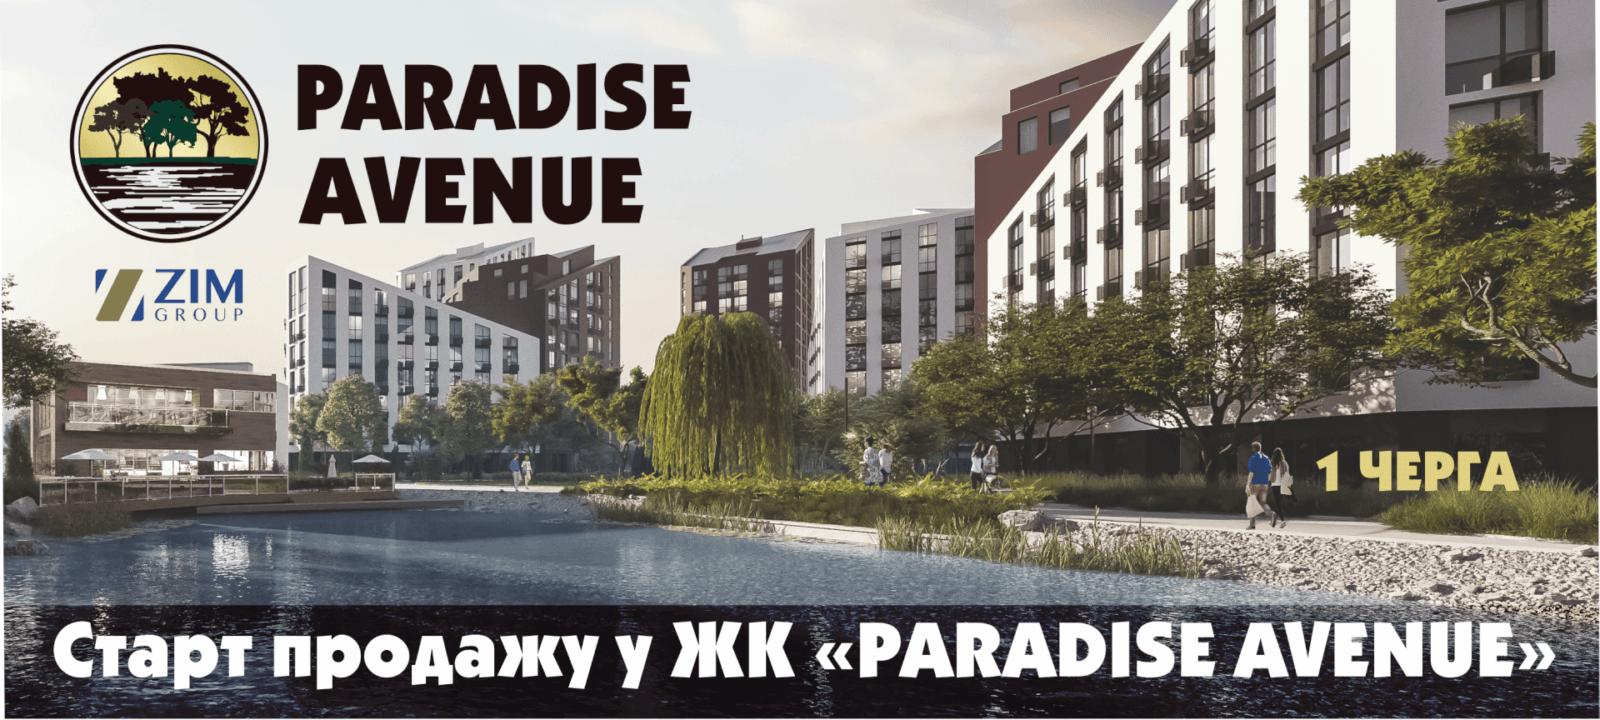 25 липня 2018 р стартує продаж квартир 1 черги в ЖК paradise Avenue